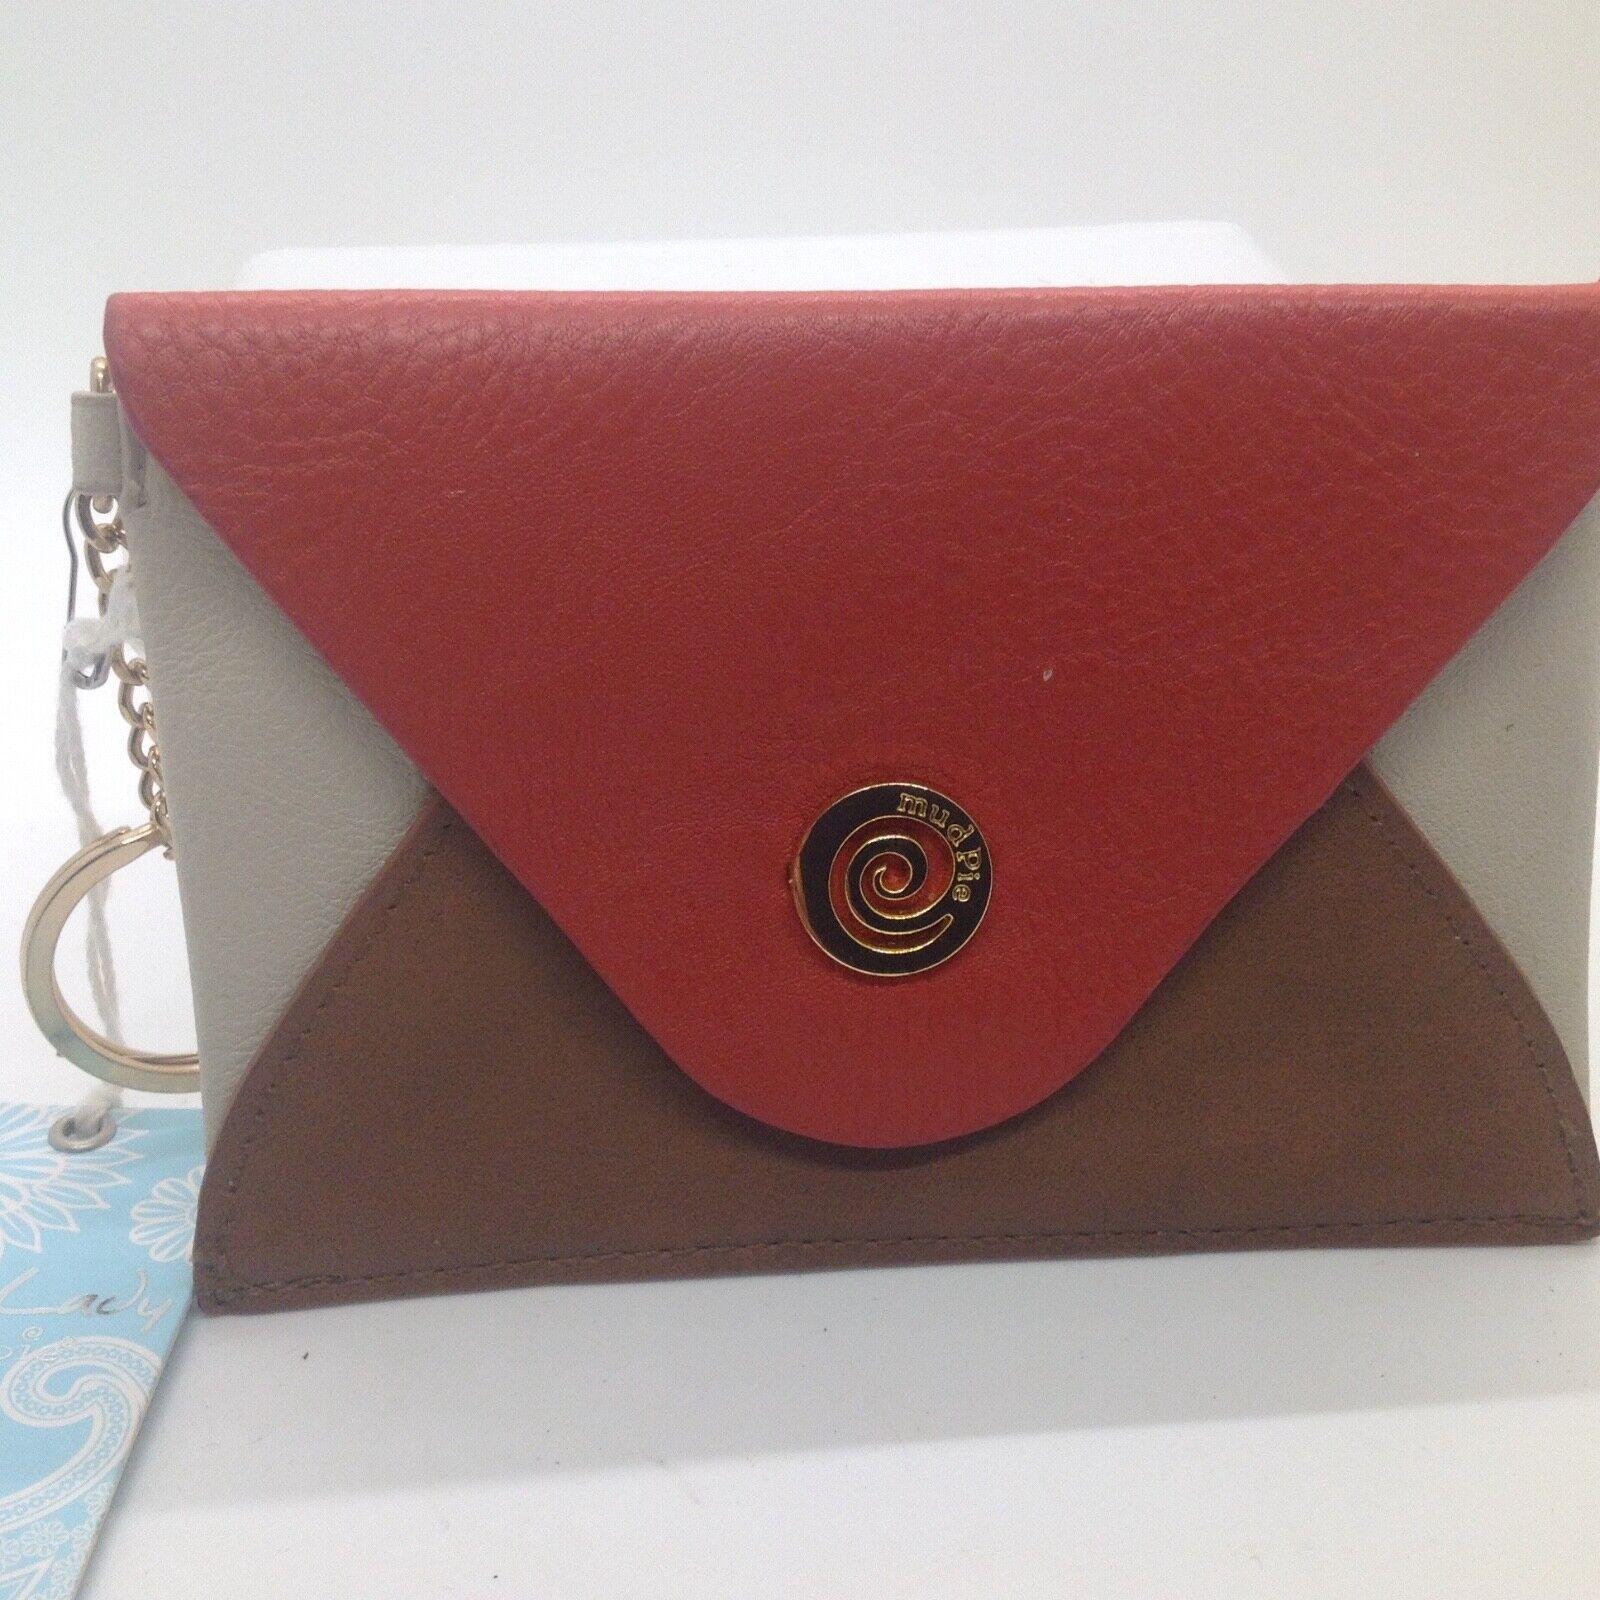 "2012 Bag Lady Mid Century Style Mudpie Envelope Keychain ID Purse 5.5 X 3.75"""